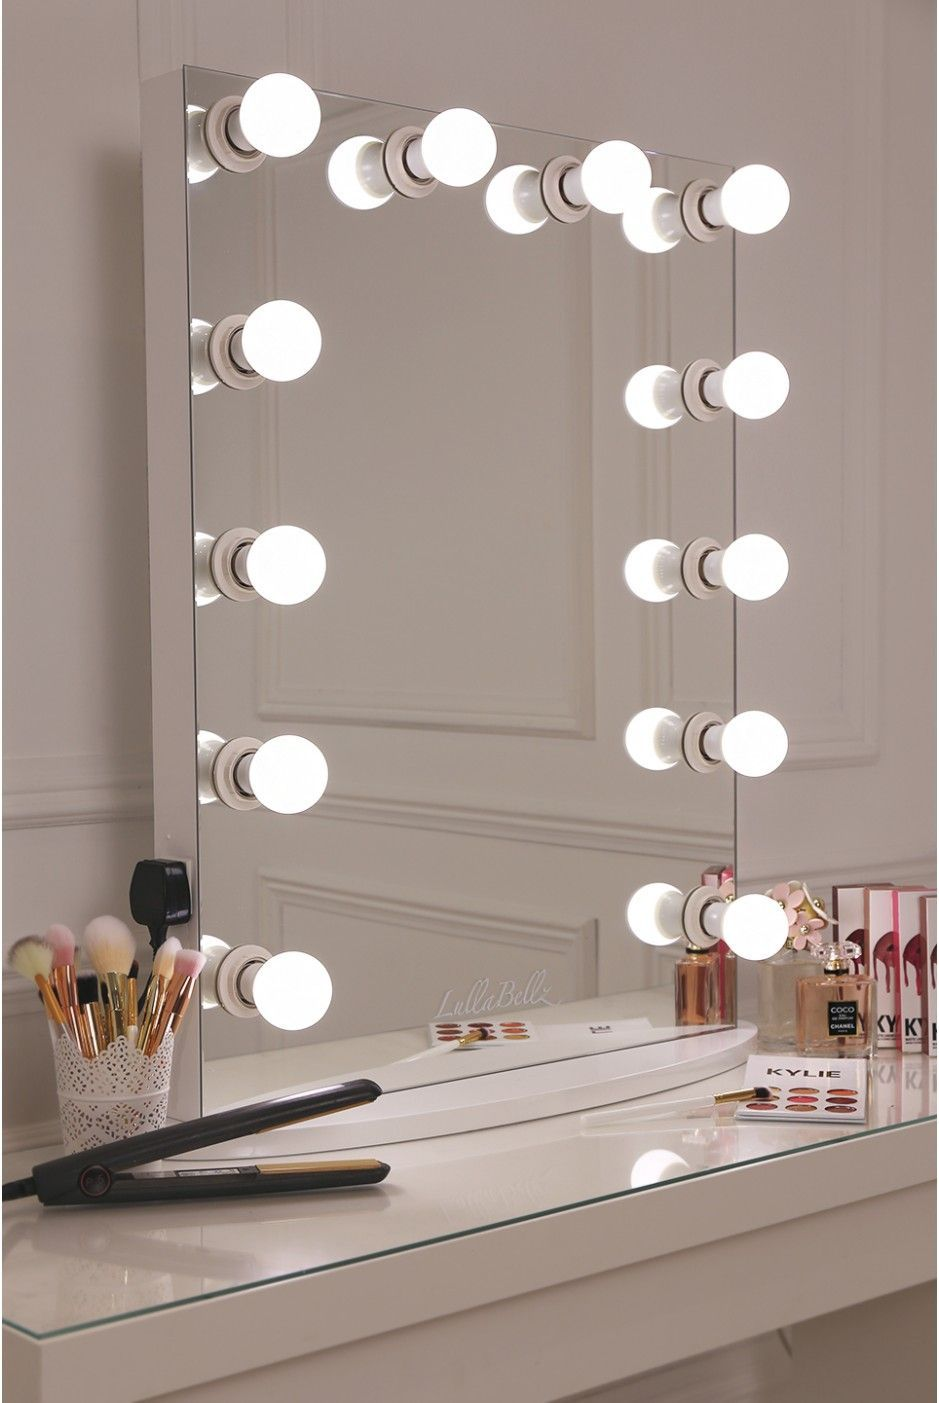 Lullabellz Hollywood Glow Kosmetikspiegel Led Lampen Das Ist Es Was Traume Zu Einem Lullabellz Hollywood In 2020 With Images Room Inspiration Diy Vanity Mirror Room Decor